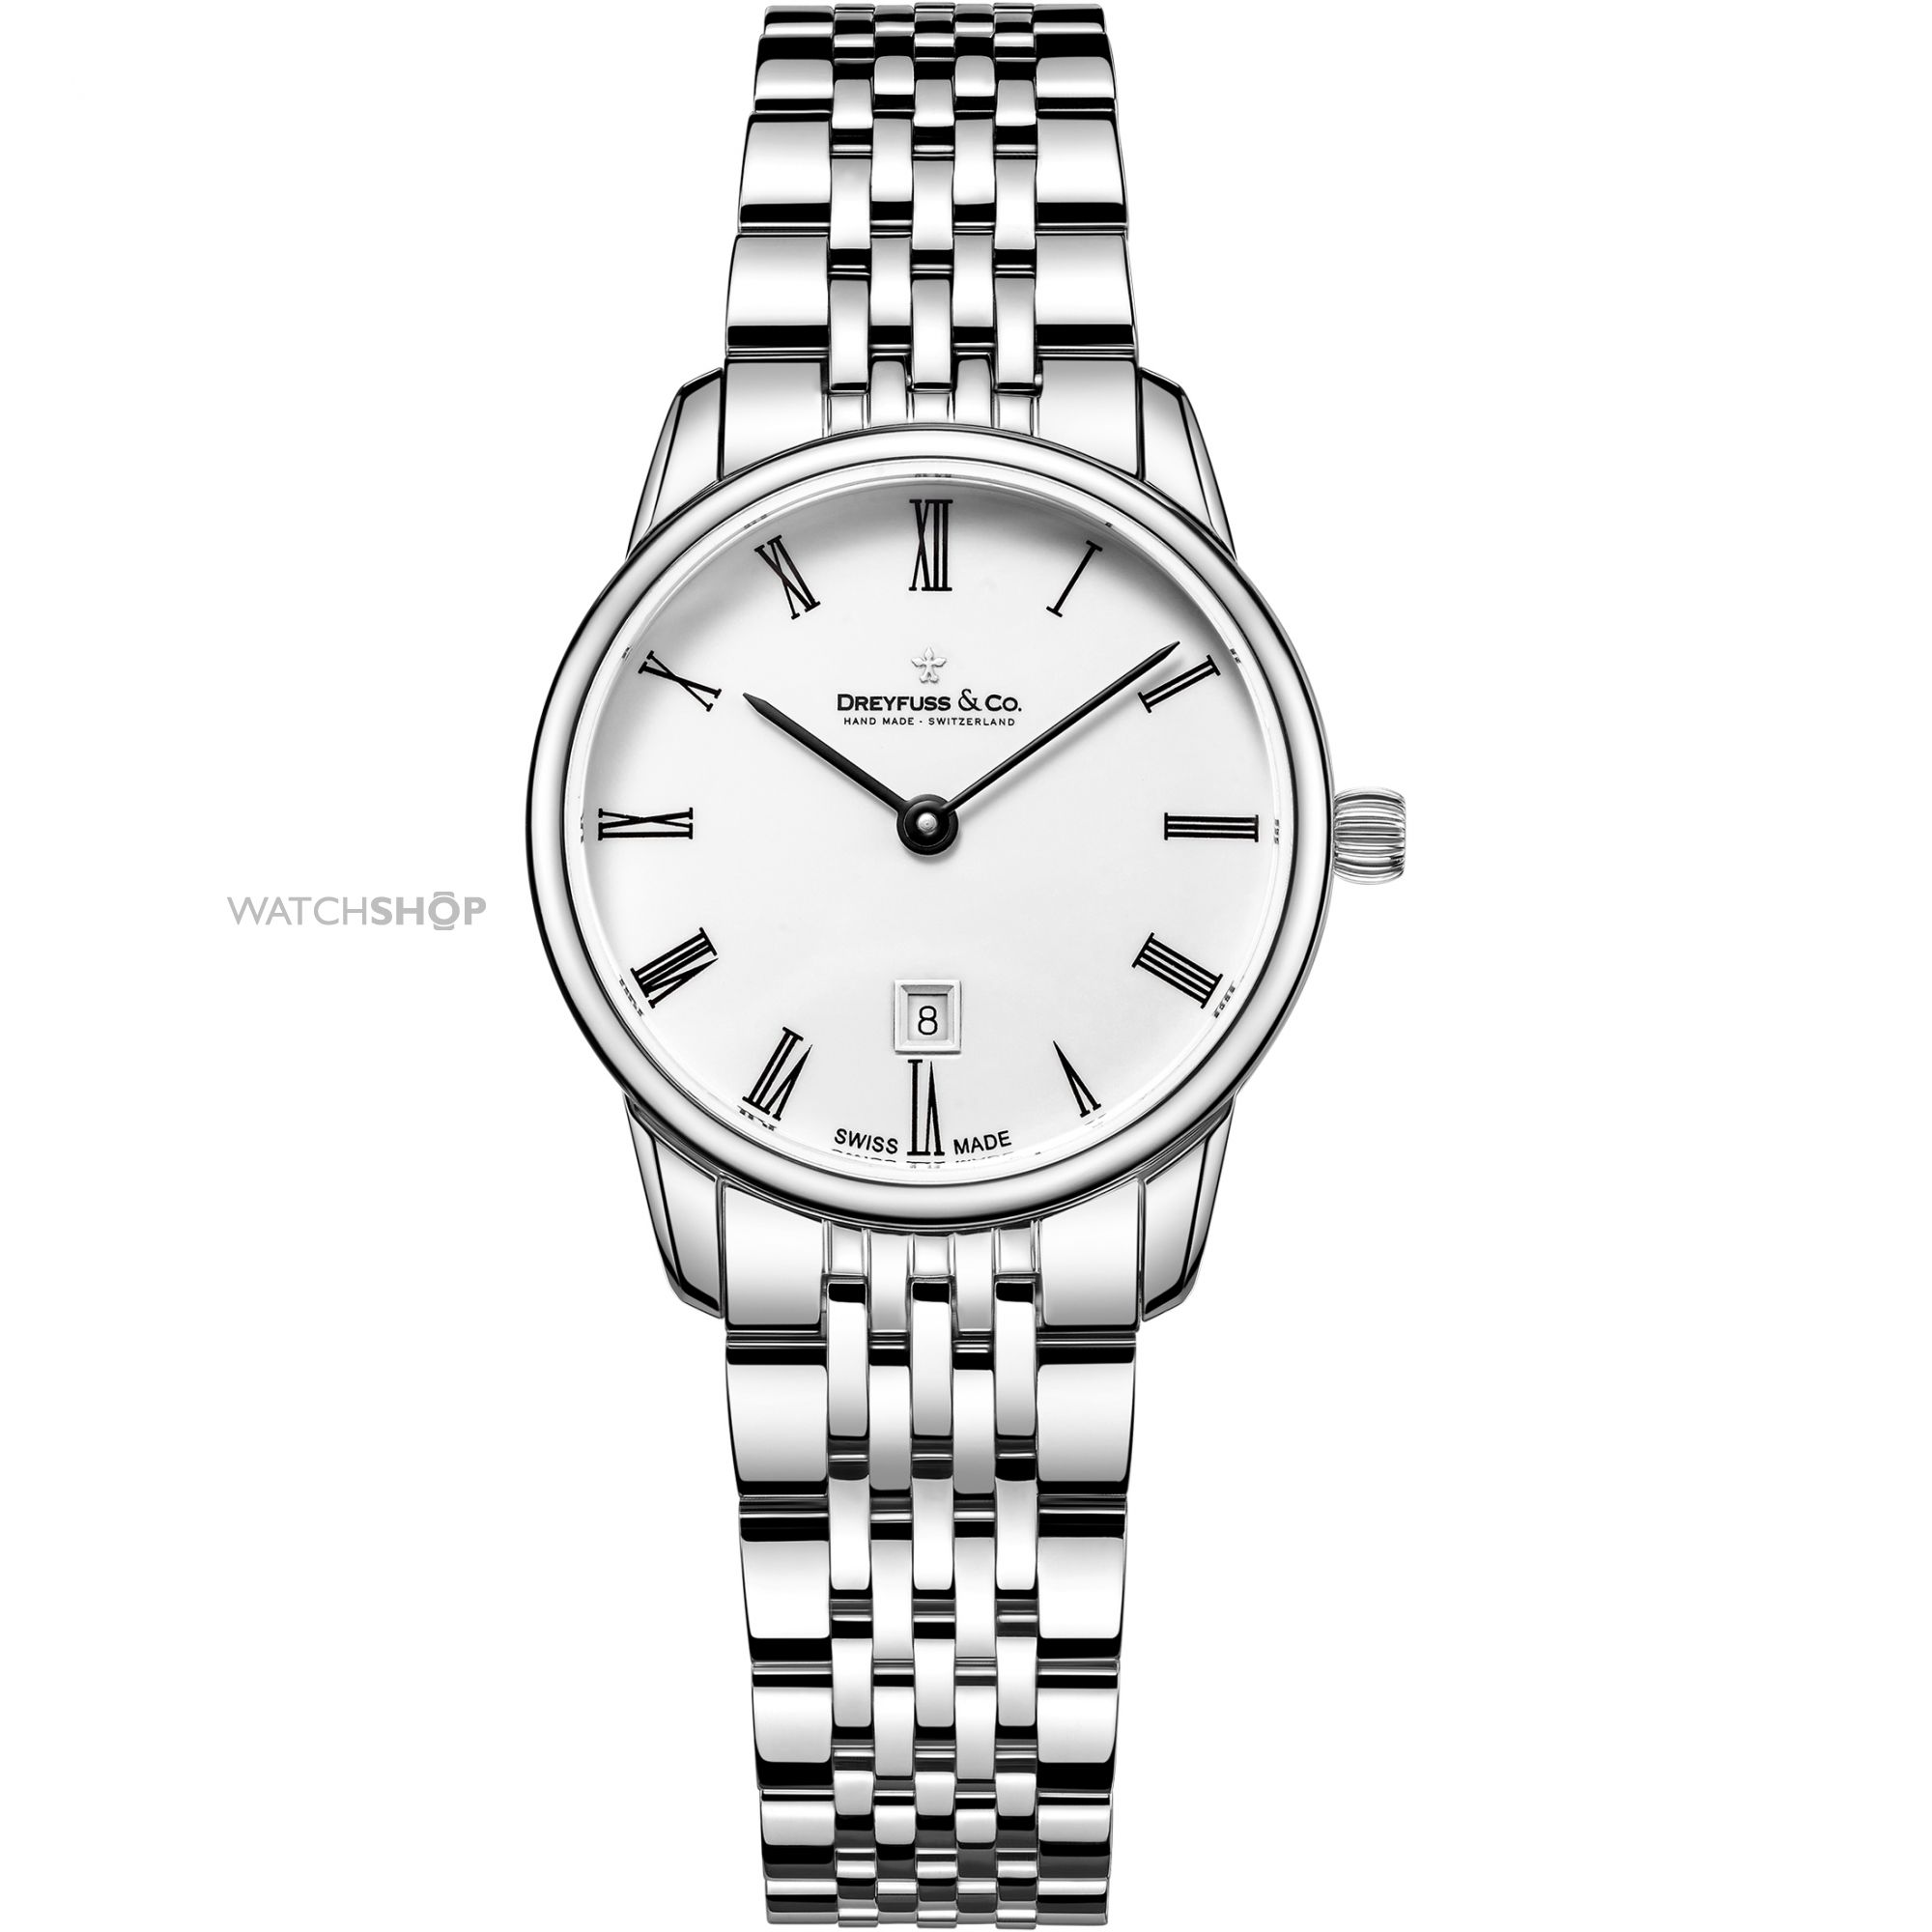 2000x2000 Ladies' Dreyfuss Amp Co 1980 Watch (Dlb0014601)